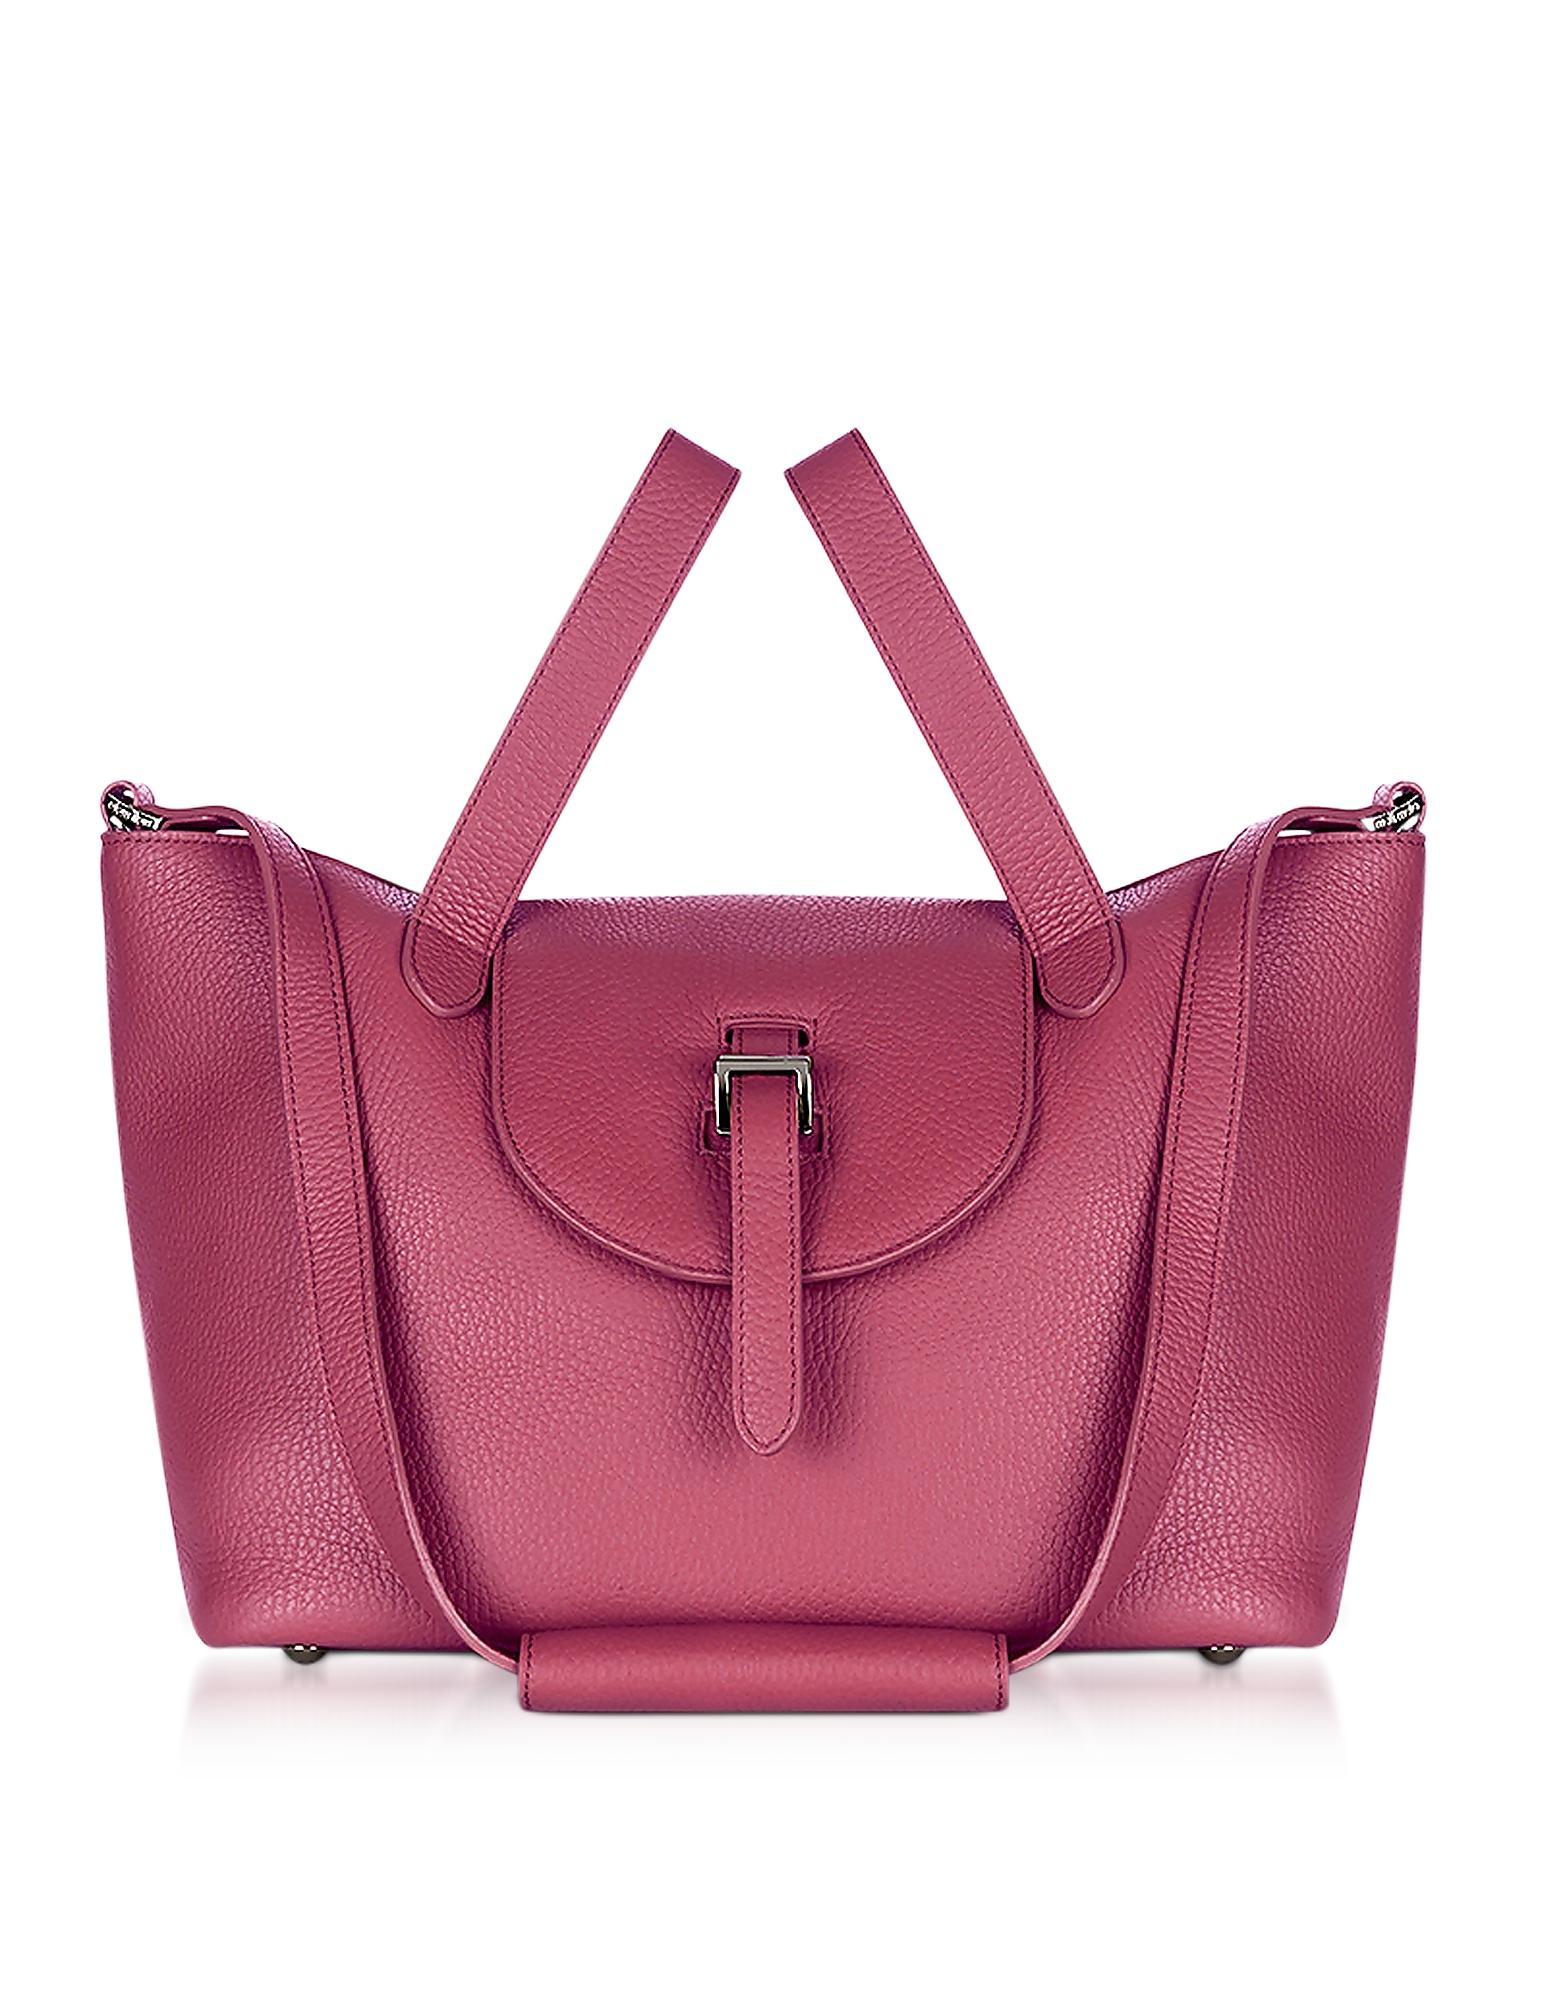 Meli Melo Handbags, Bordeaux Leather Thela Medium Tote Bag